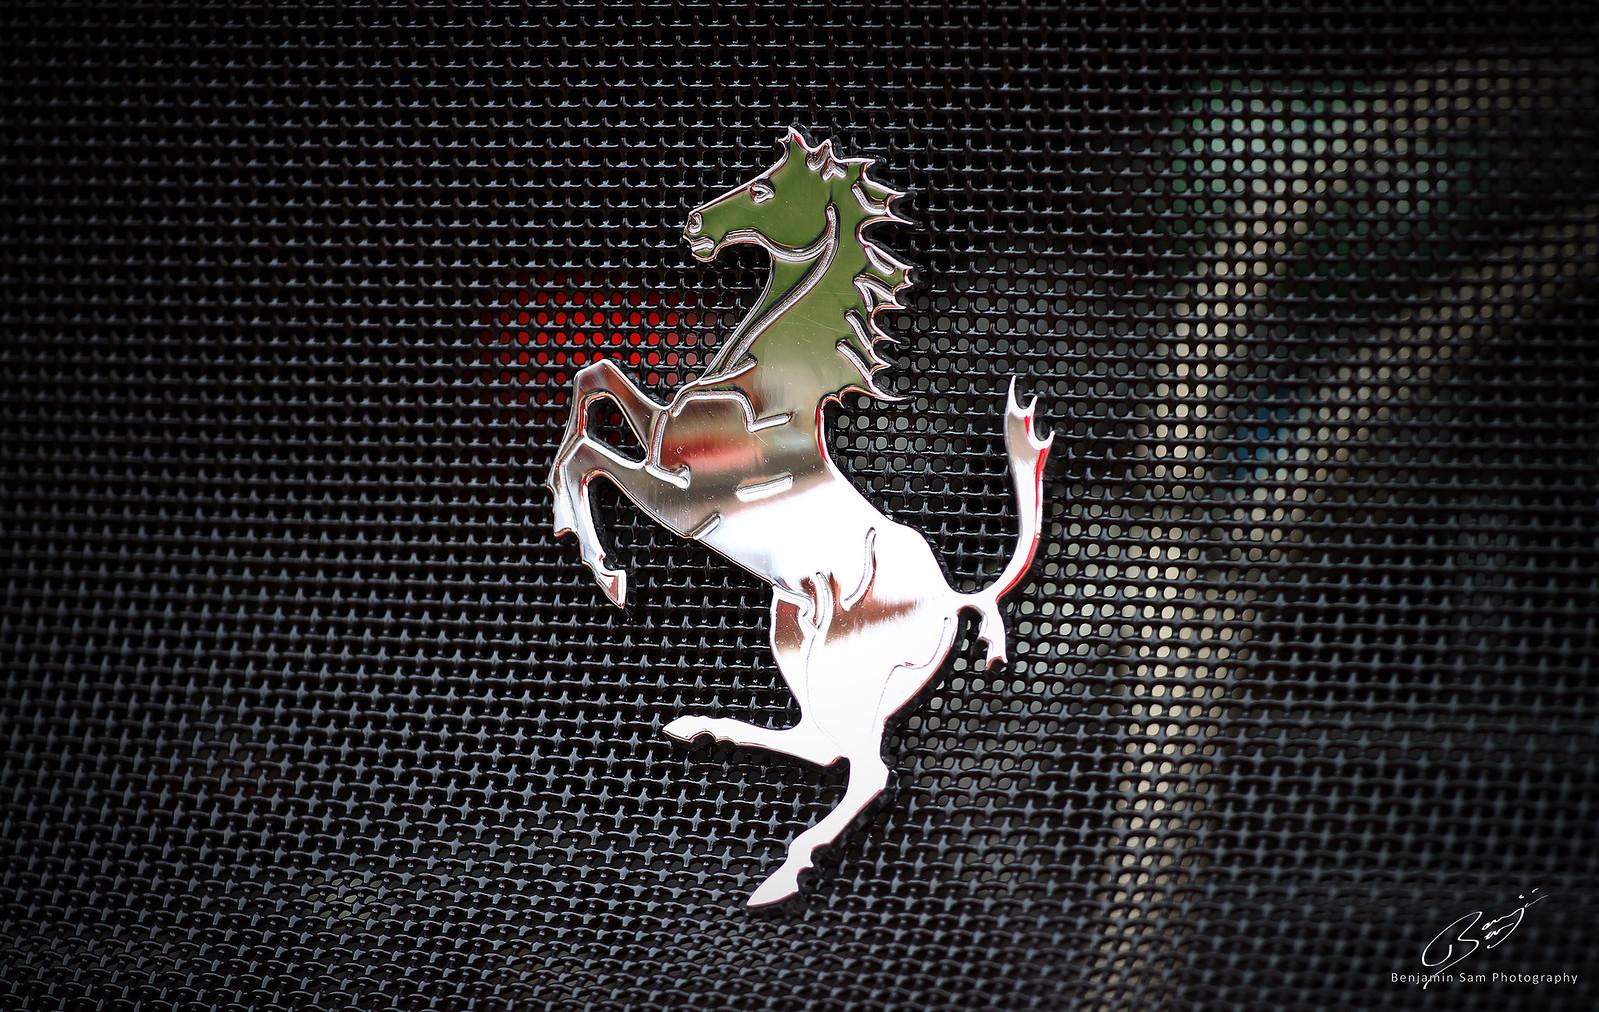 F50 Prancing Horse